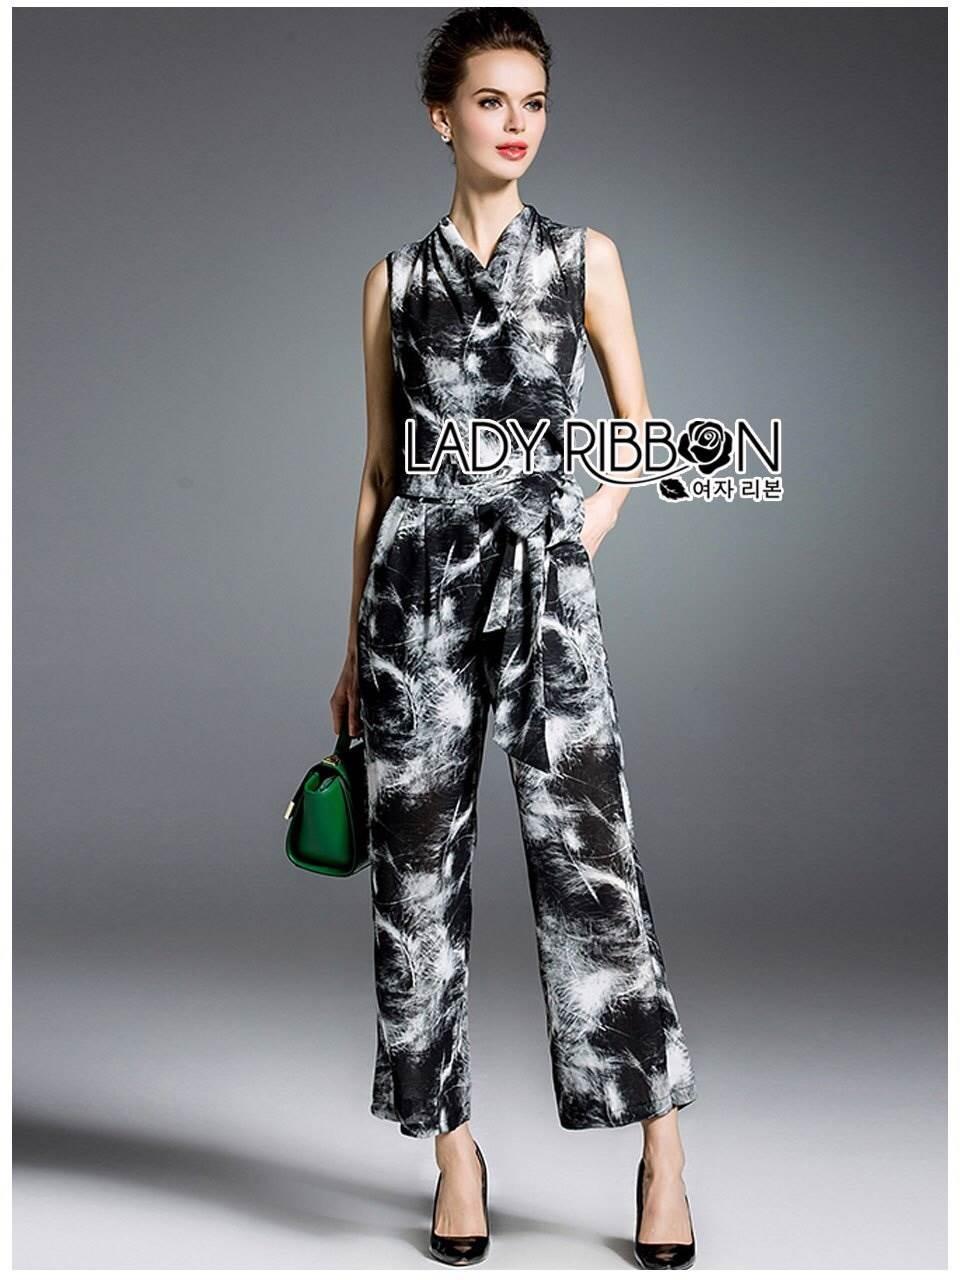 🎀 Lady Ribbon's Made 🎀Lady Matina Spotted Printed Ribbon Jumpsuit